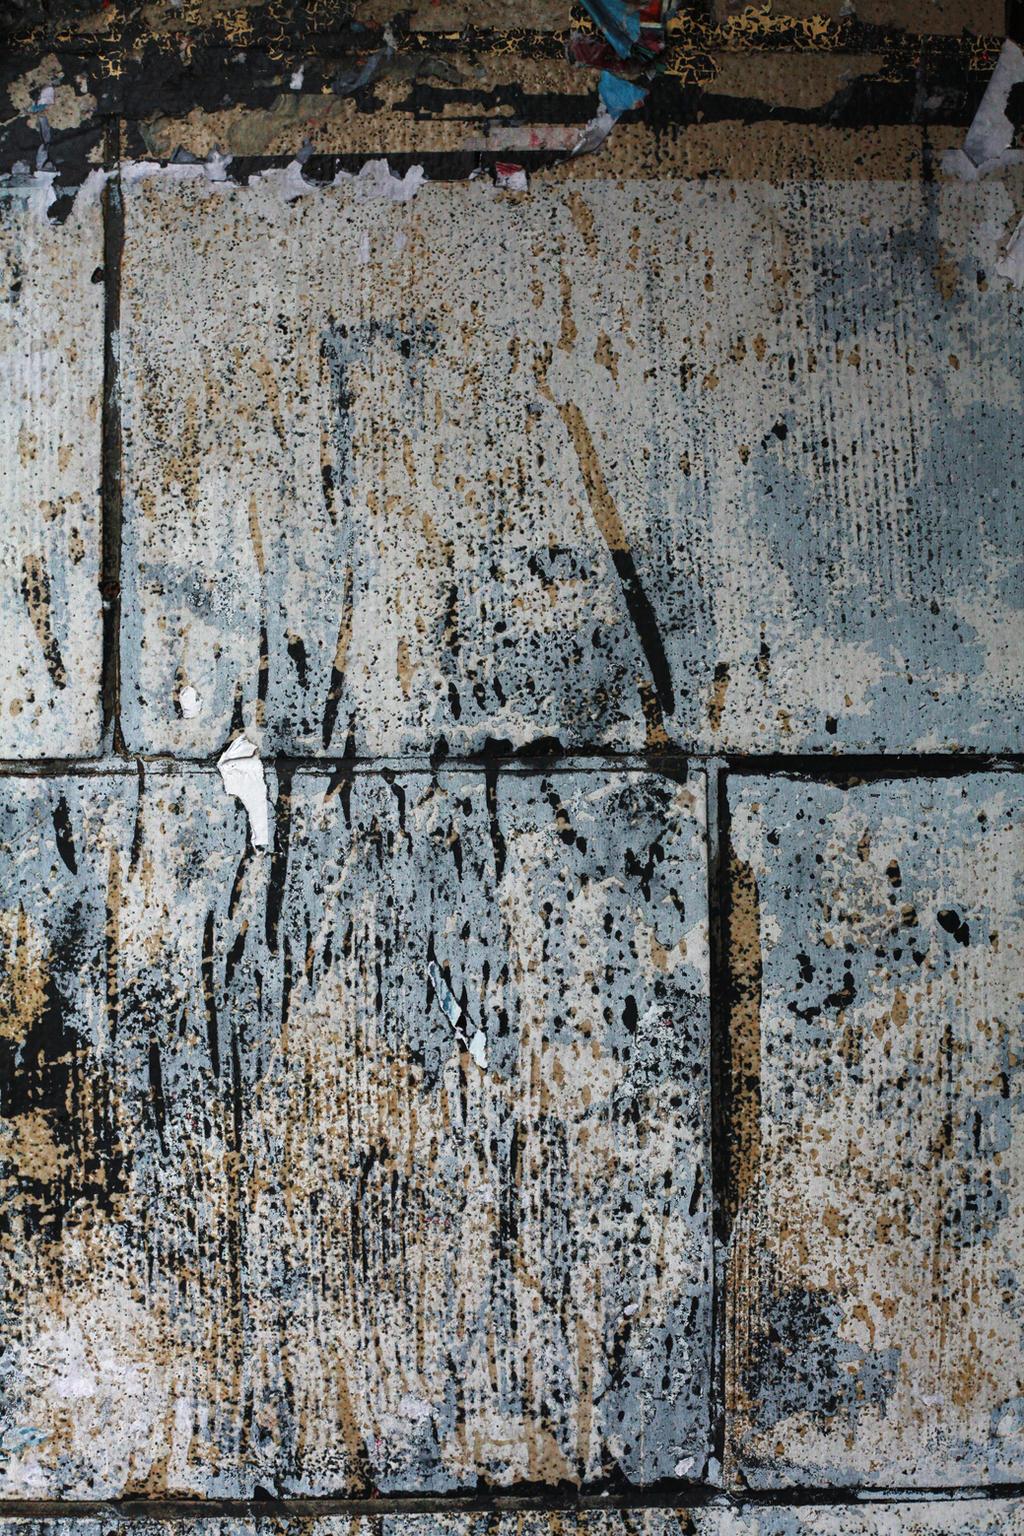 Torn Poster Grunge Texture by shhhhh-art-Stock